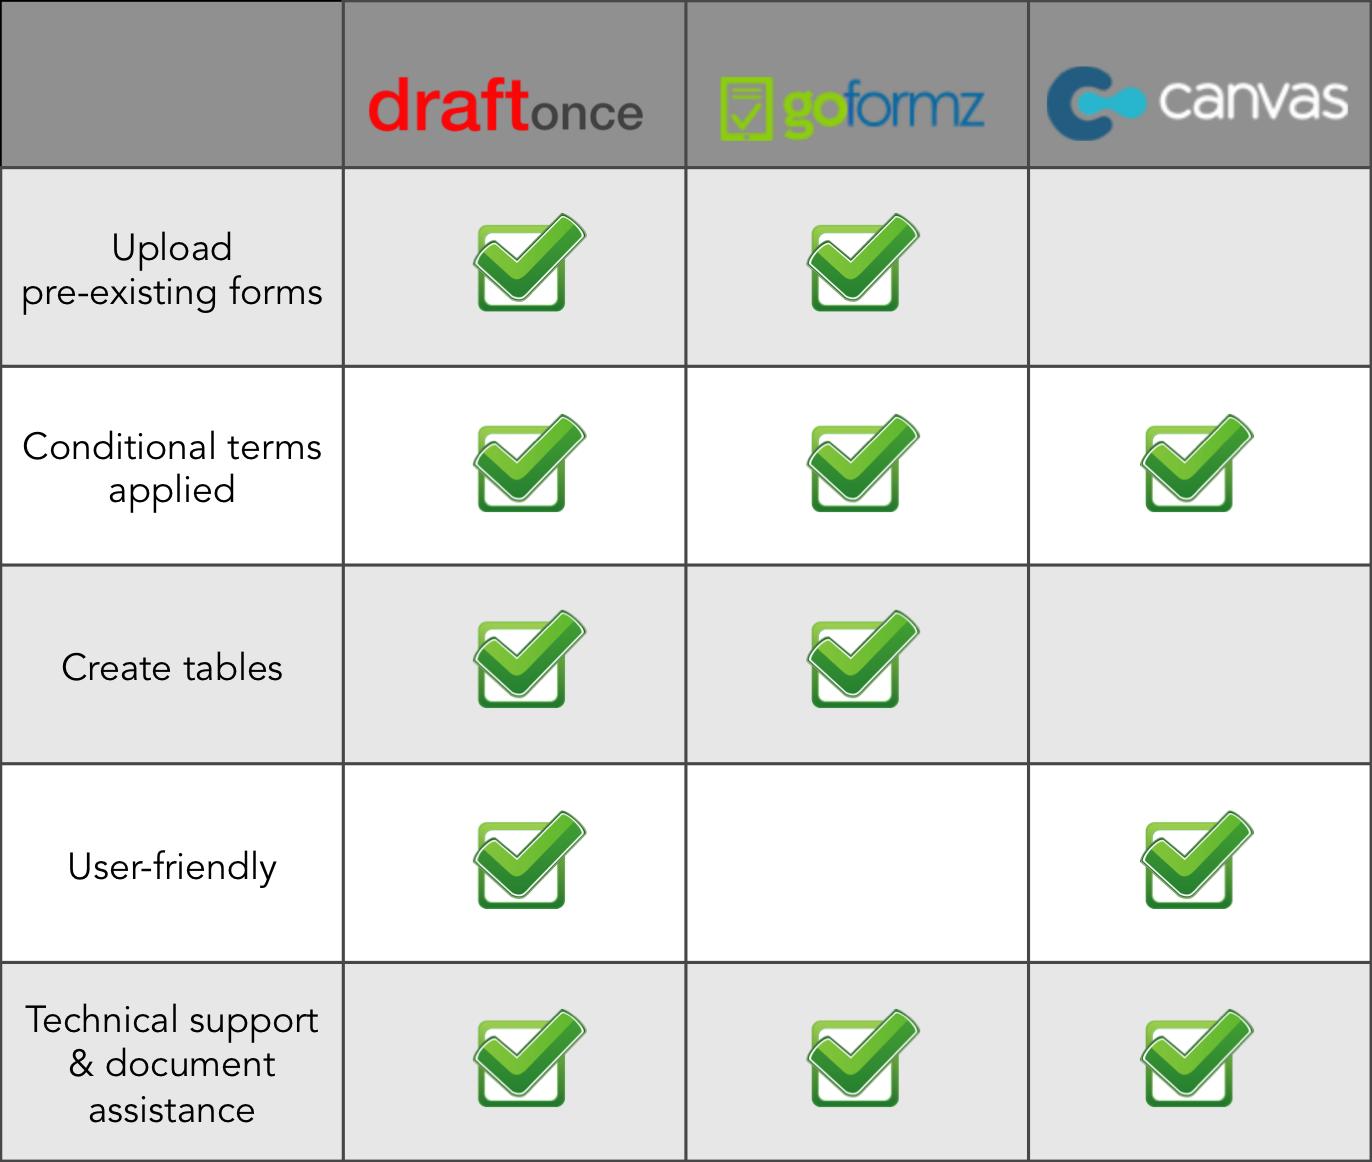 document assembly comparison chart